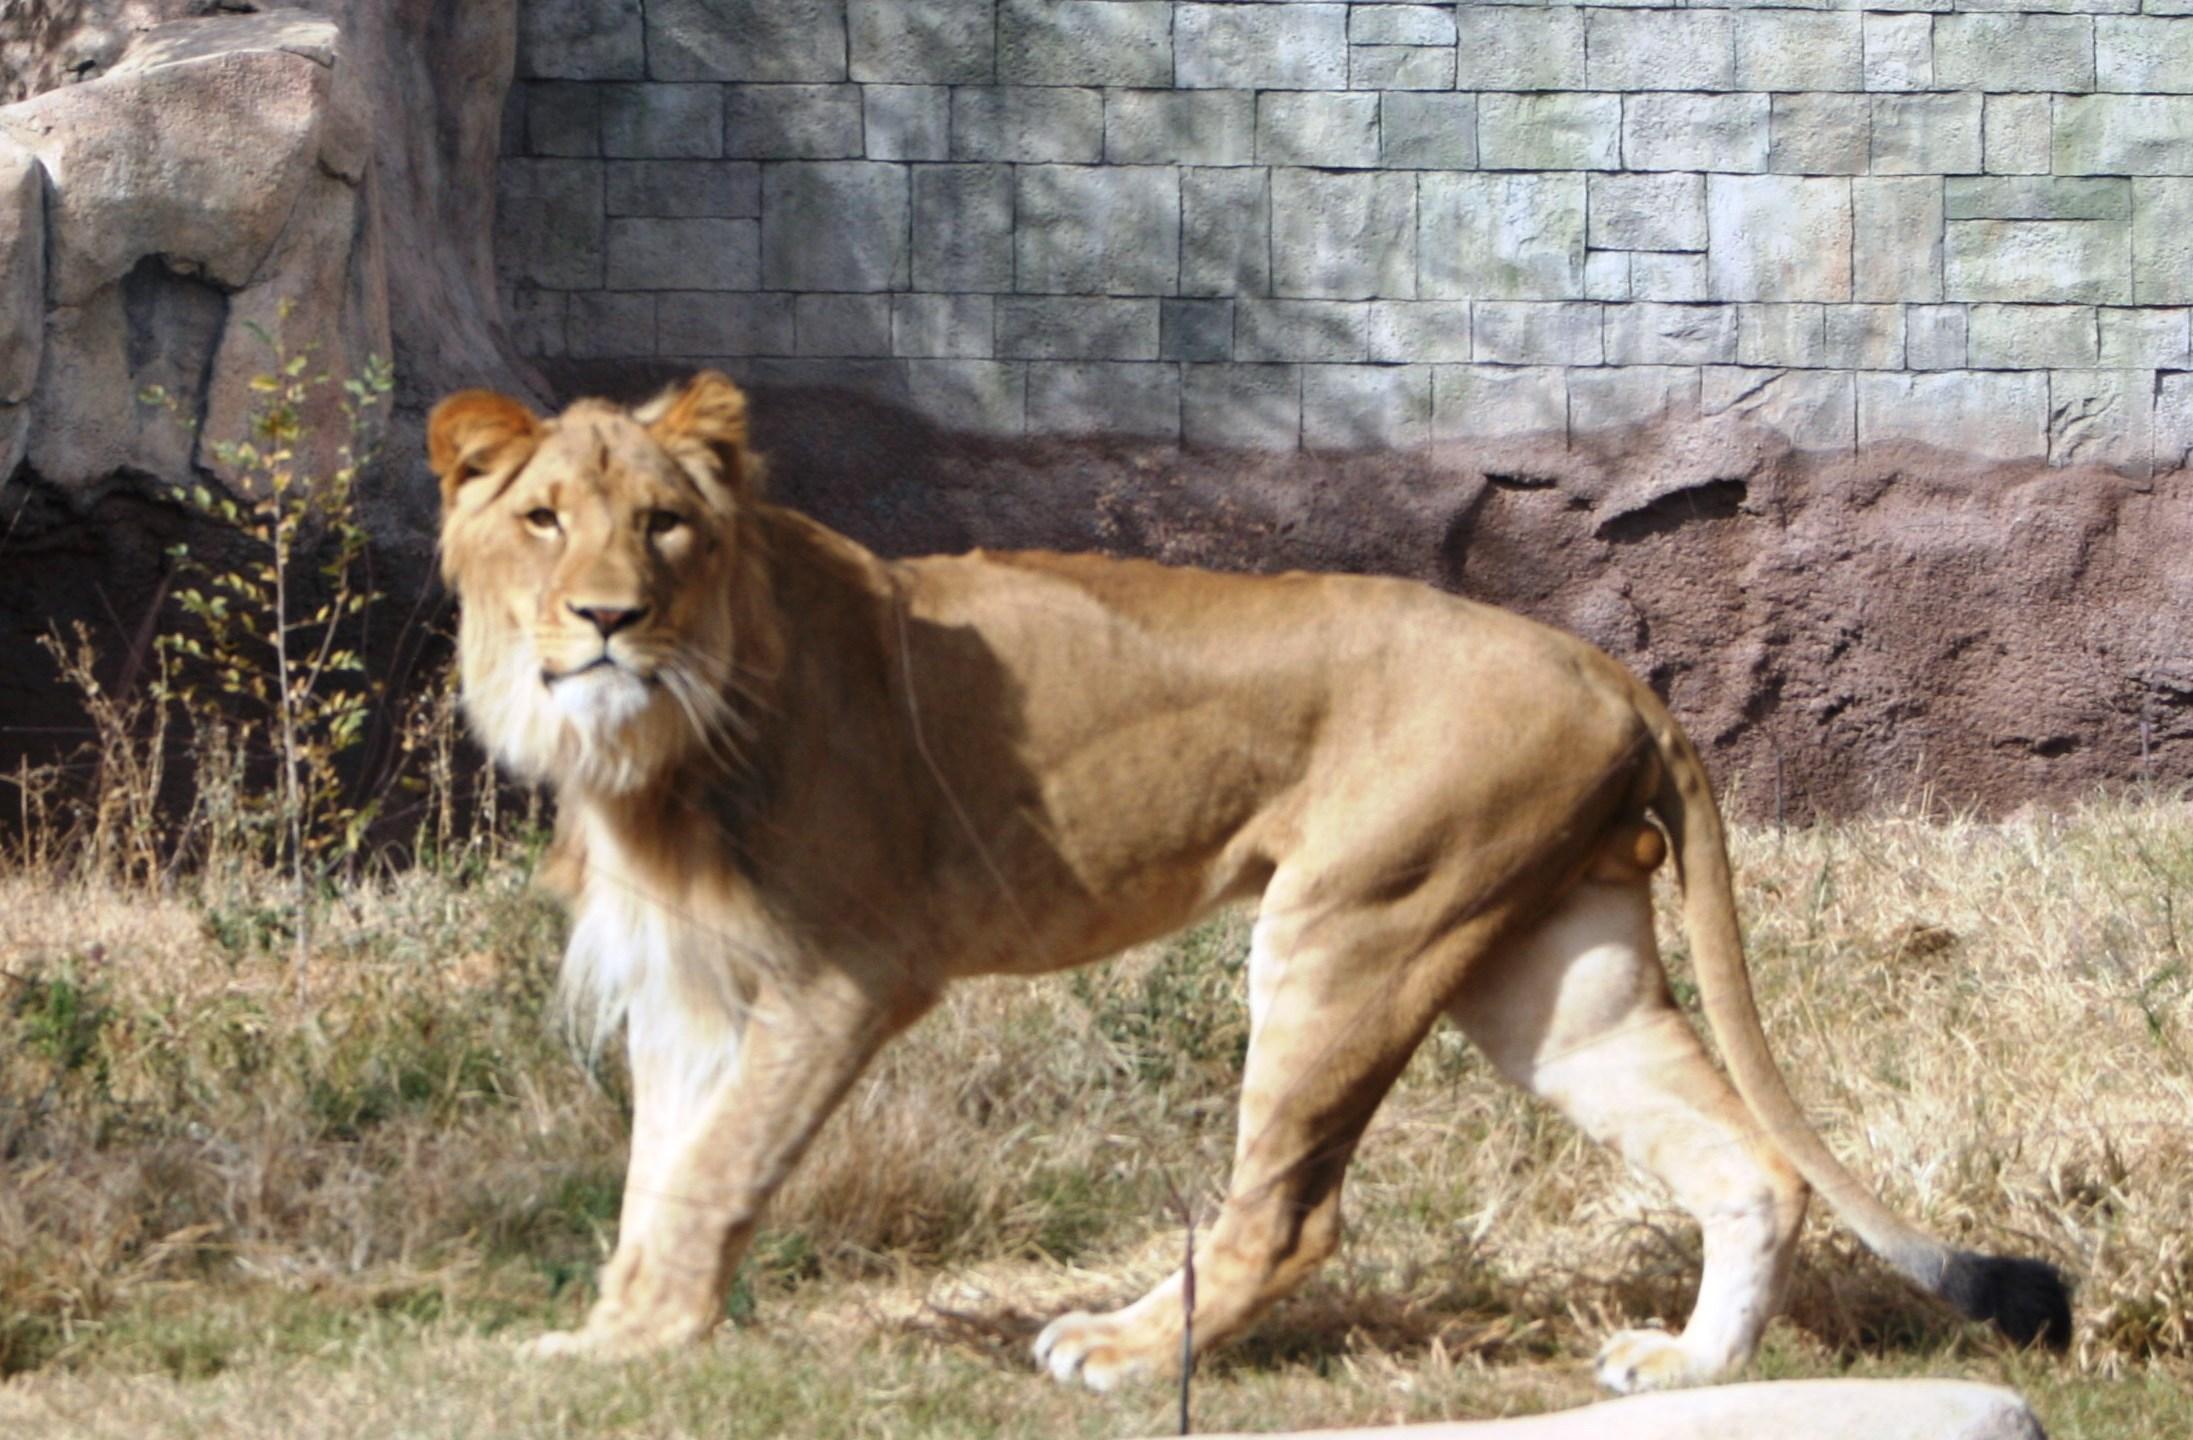 Rudo_Zoo Lion_1456164672204.JPG